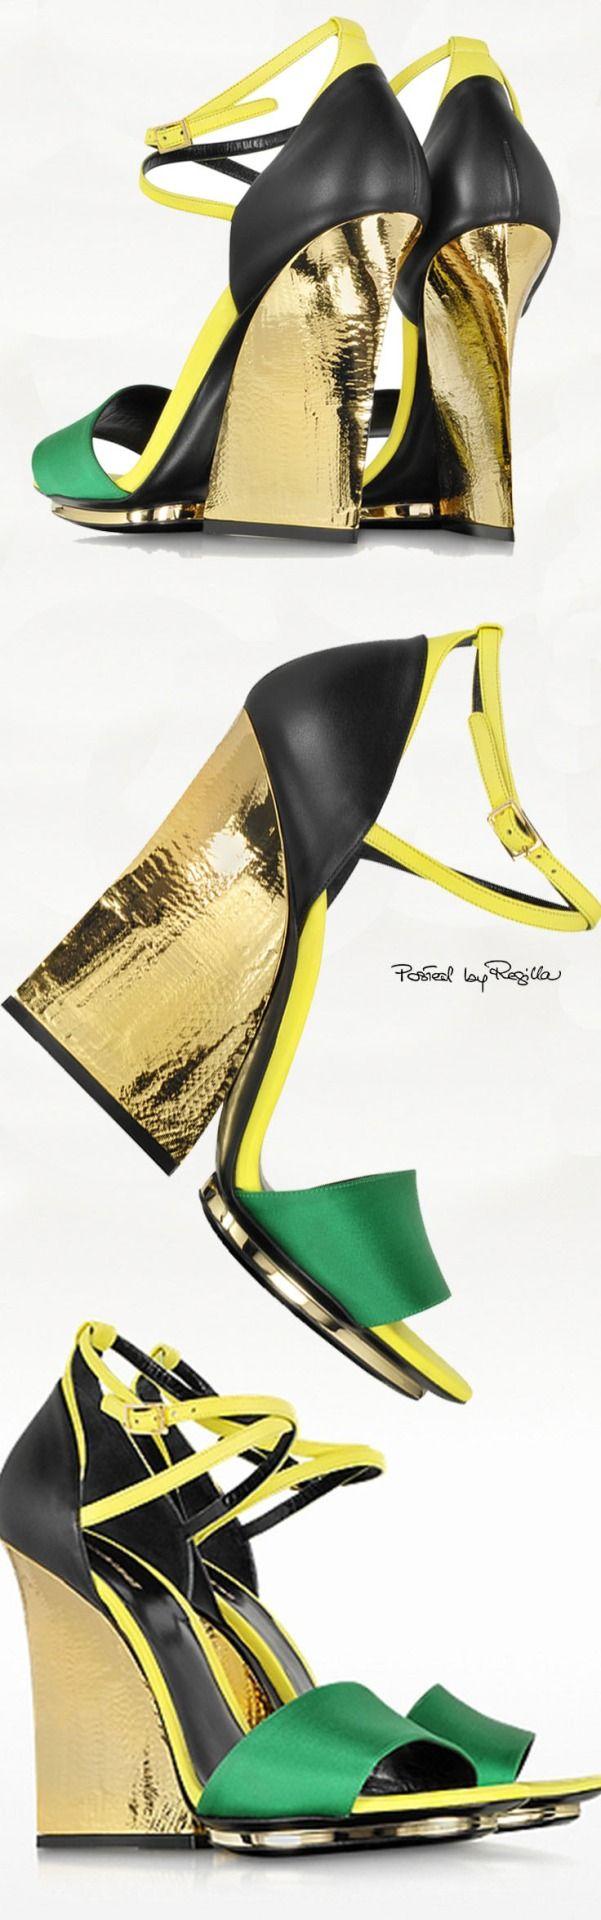 Jamaican sandals shoes - Roberto Cavalli Shoe Wedgeswedge Sandalsshoes